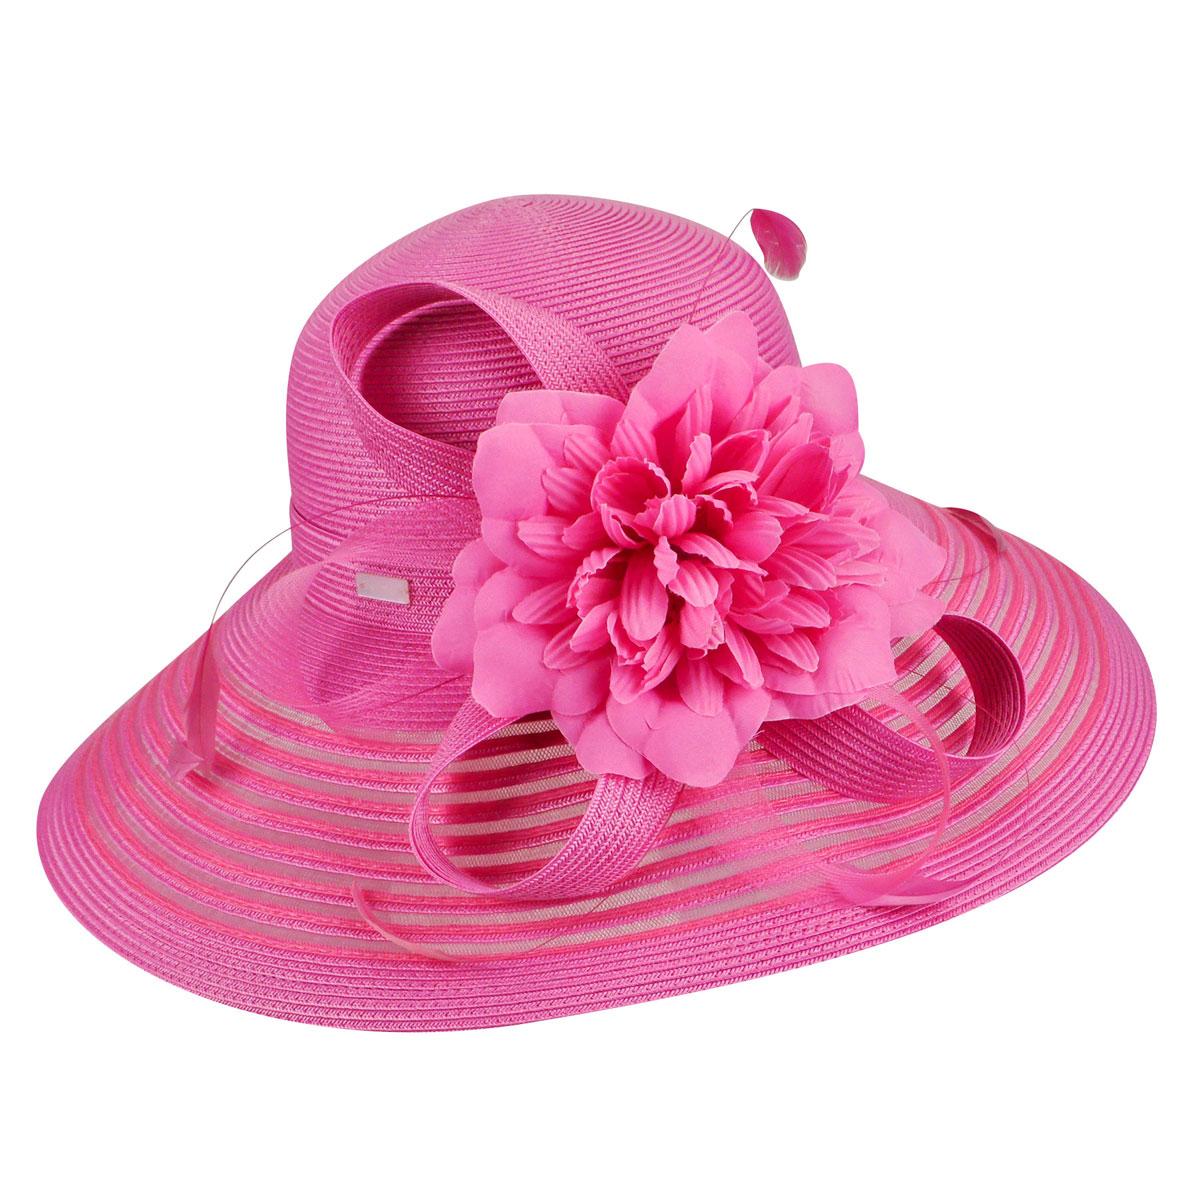 Edwardian Style Hats, Titanic Hats, Derby Hats Lanna Hat $30.00 AT vintagedancer.com